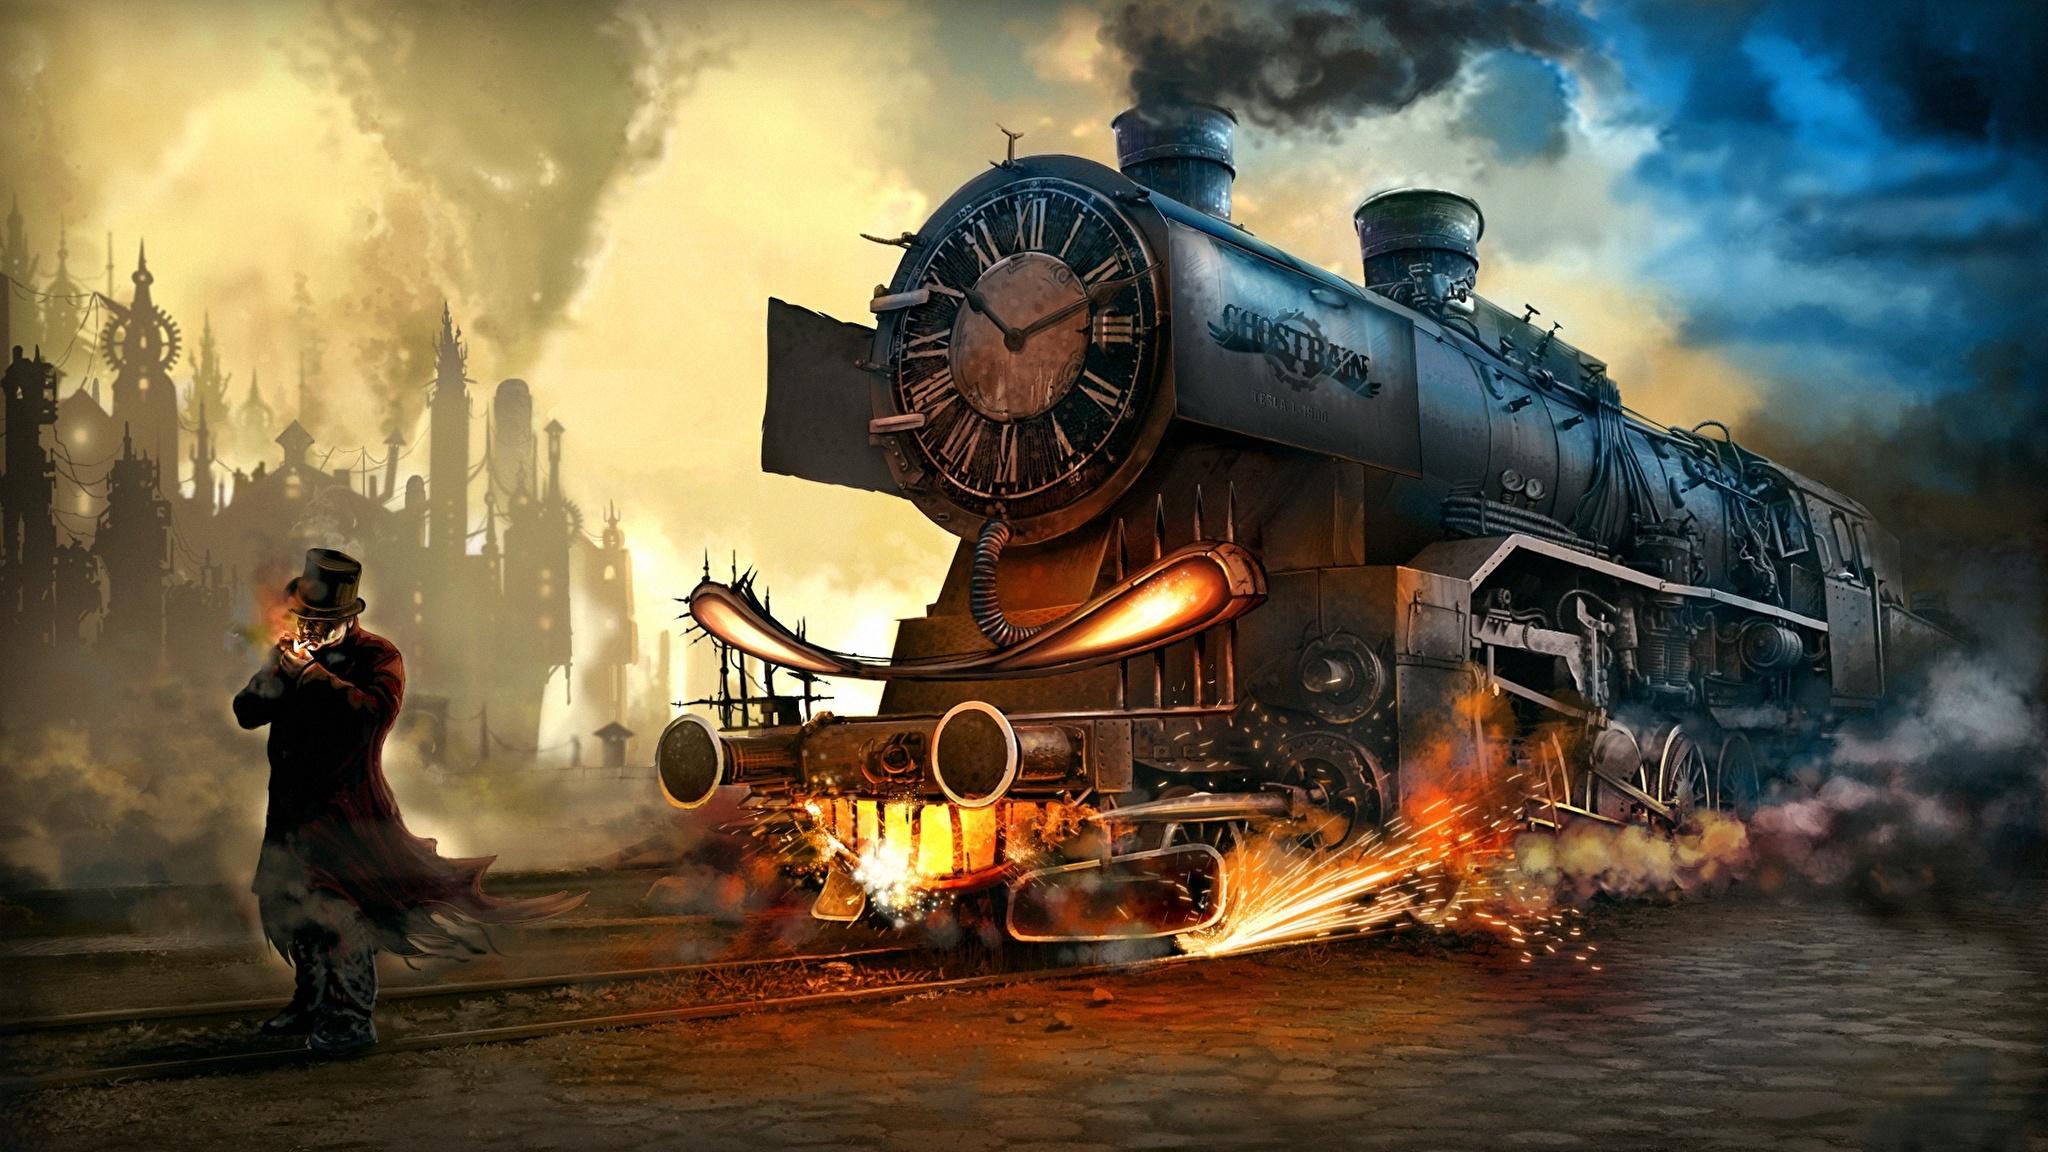 Картинка Стимпанк Мужчины Фэнтези Поезда 2048x1152 паропанк мужчина Фантастика